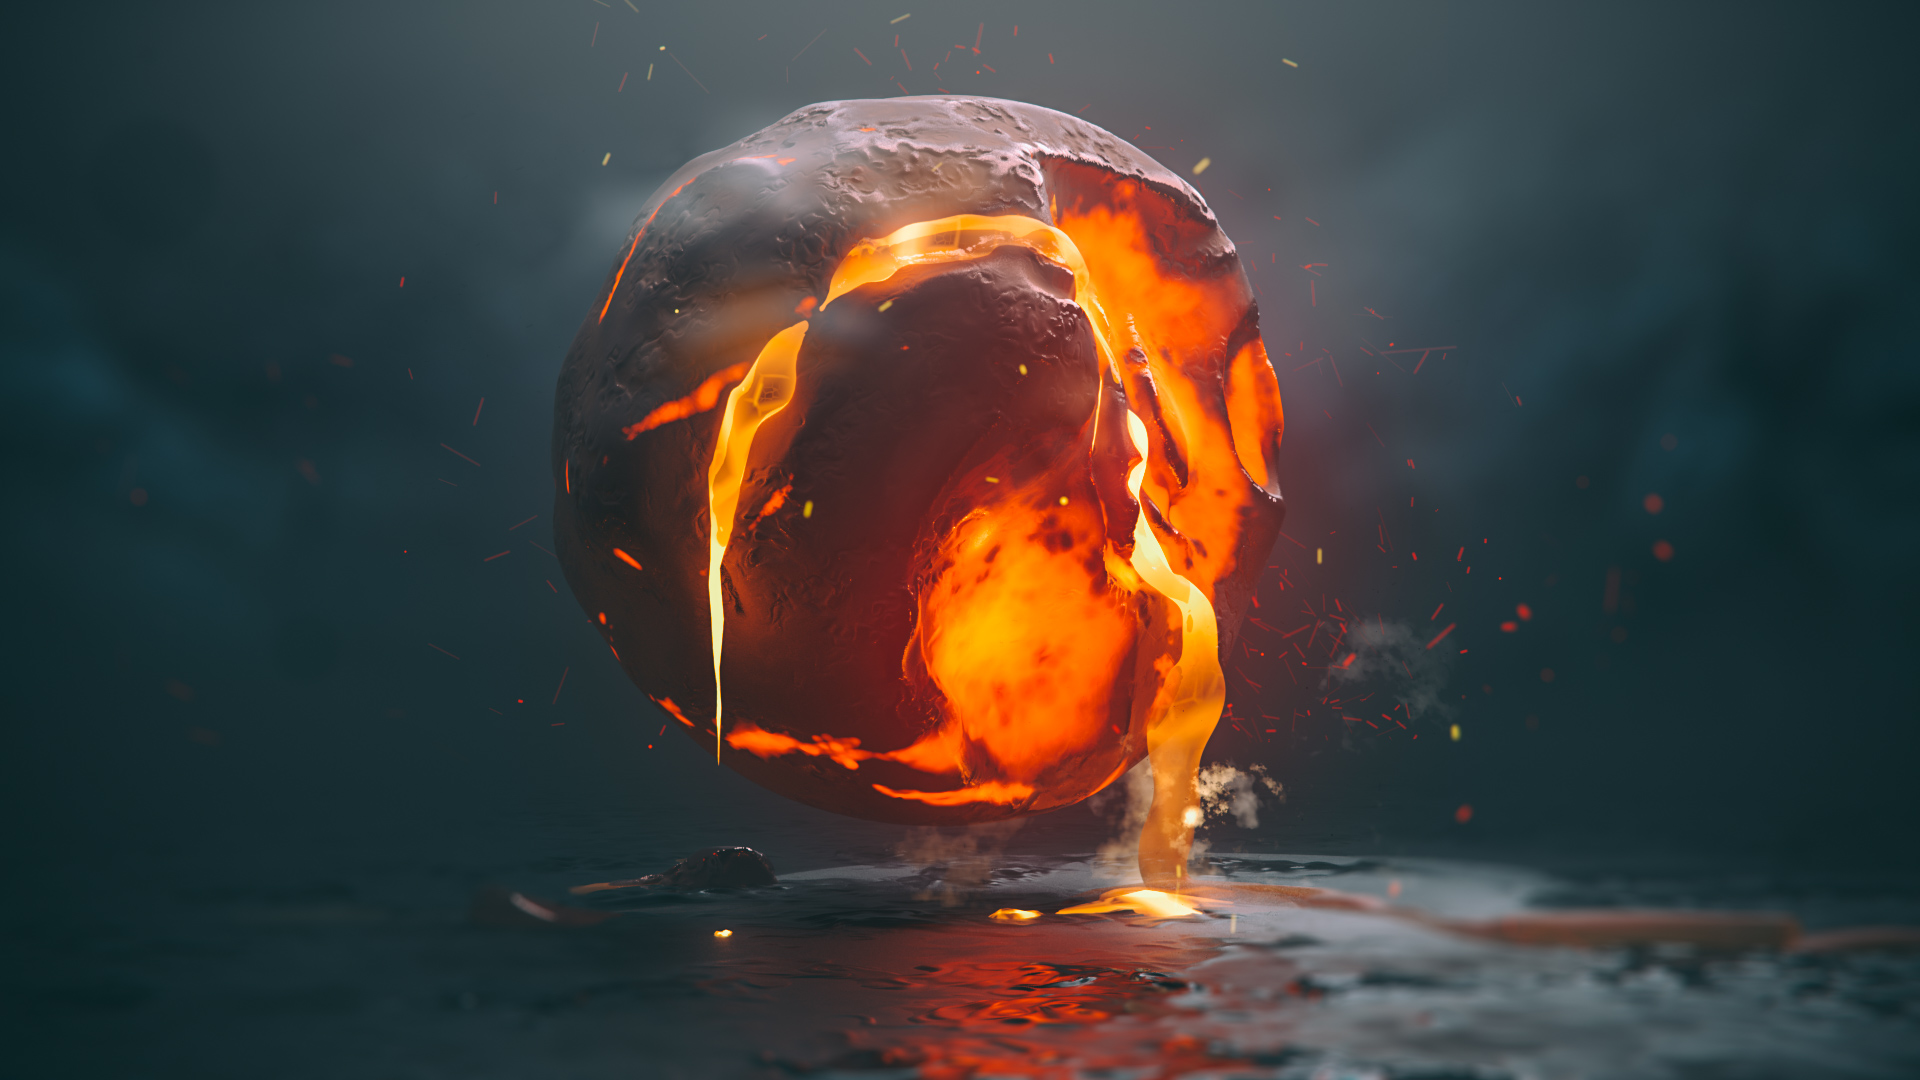 General 1920x1080 lava lava render render digital digital digital art abstract 3D Abstract